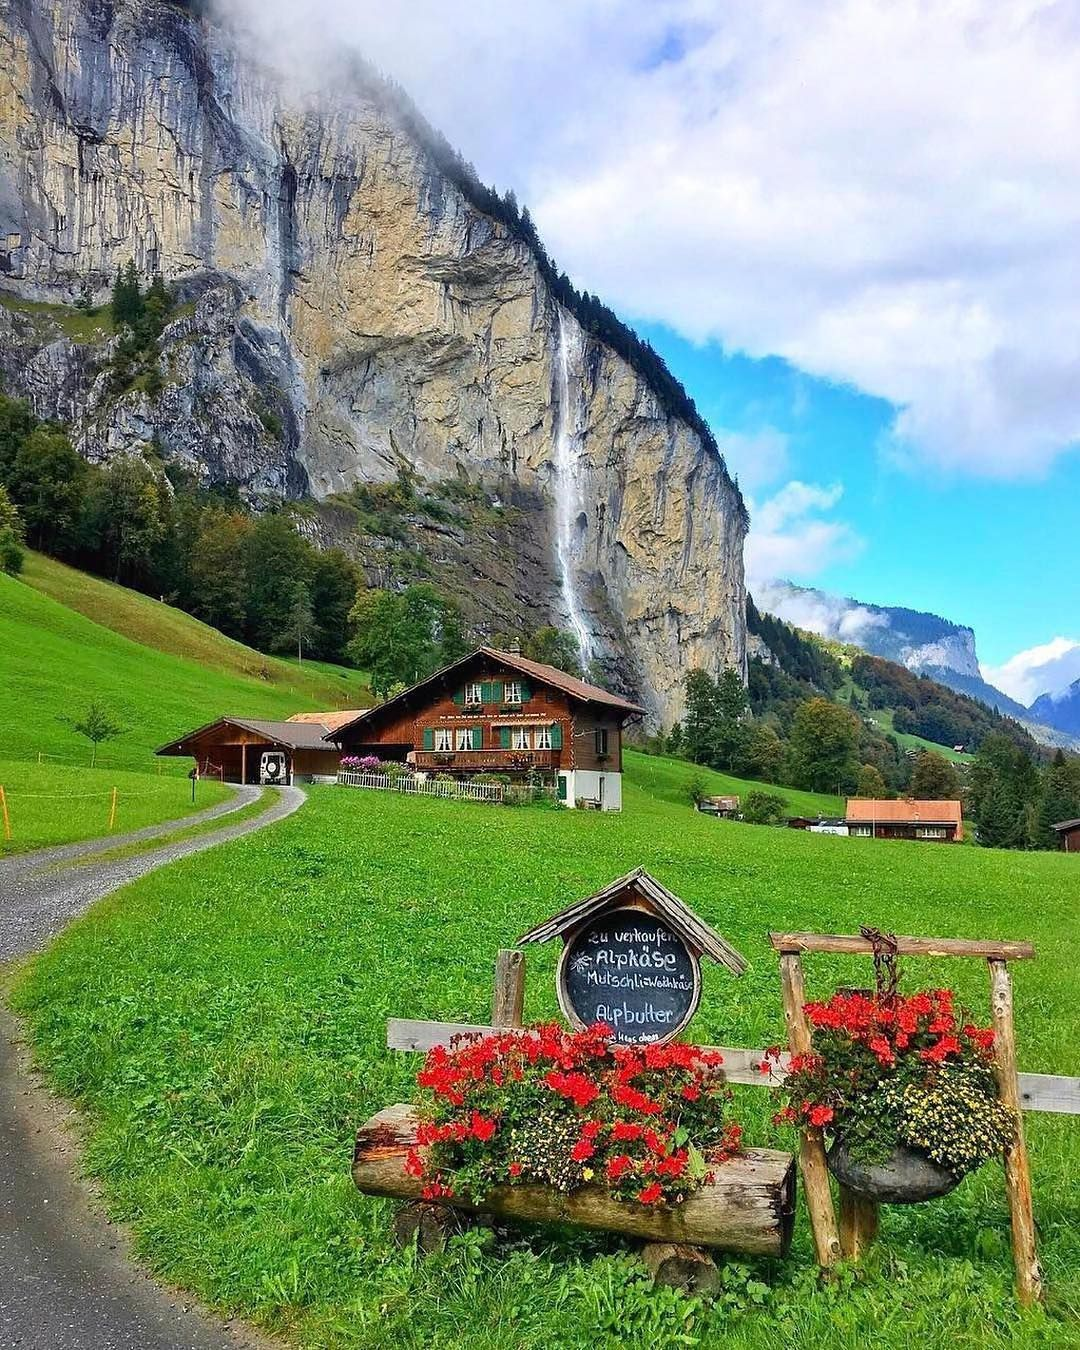 Places To Visit In Switzerland Blog: Beautiful Morning Walk Lauterbrunnen Switzerland. Photo By